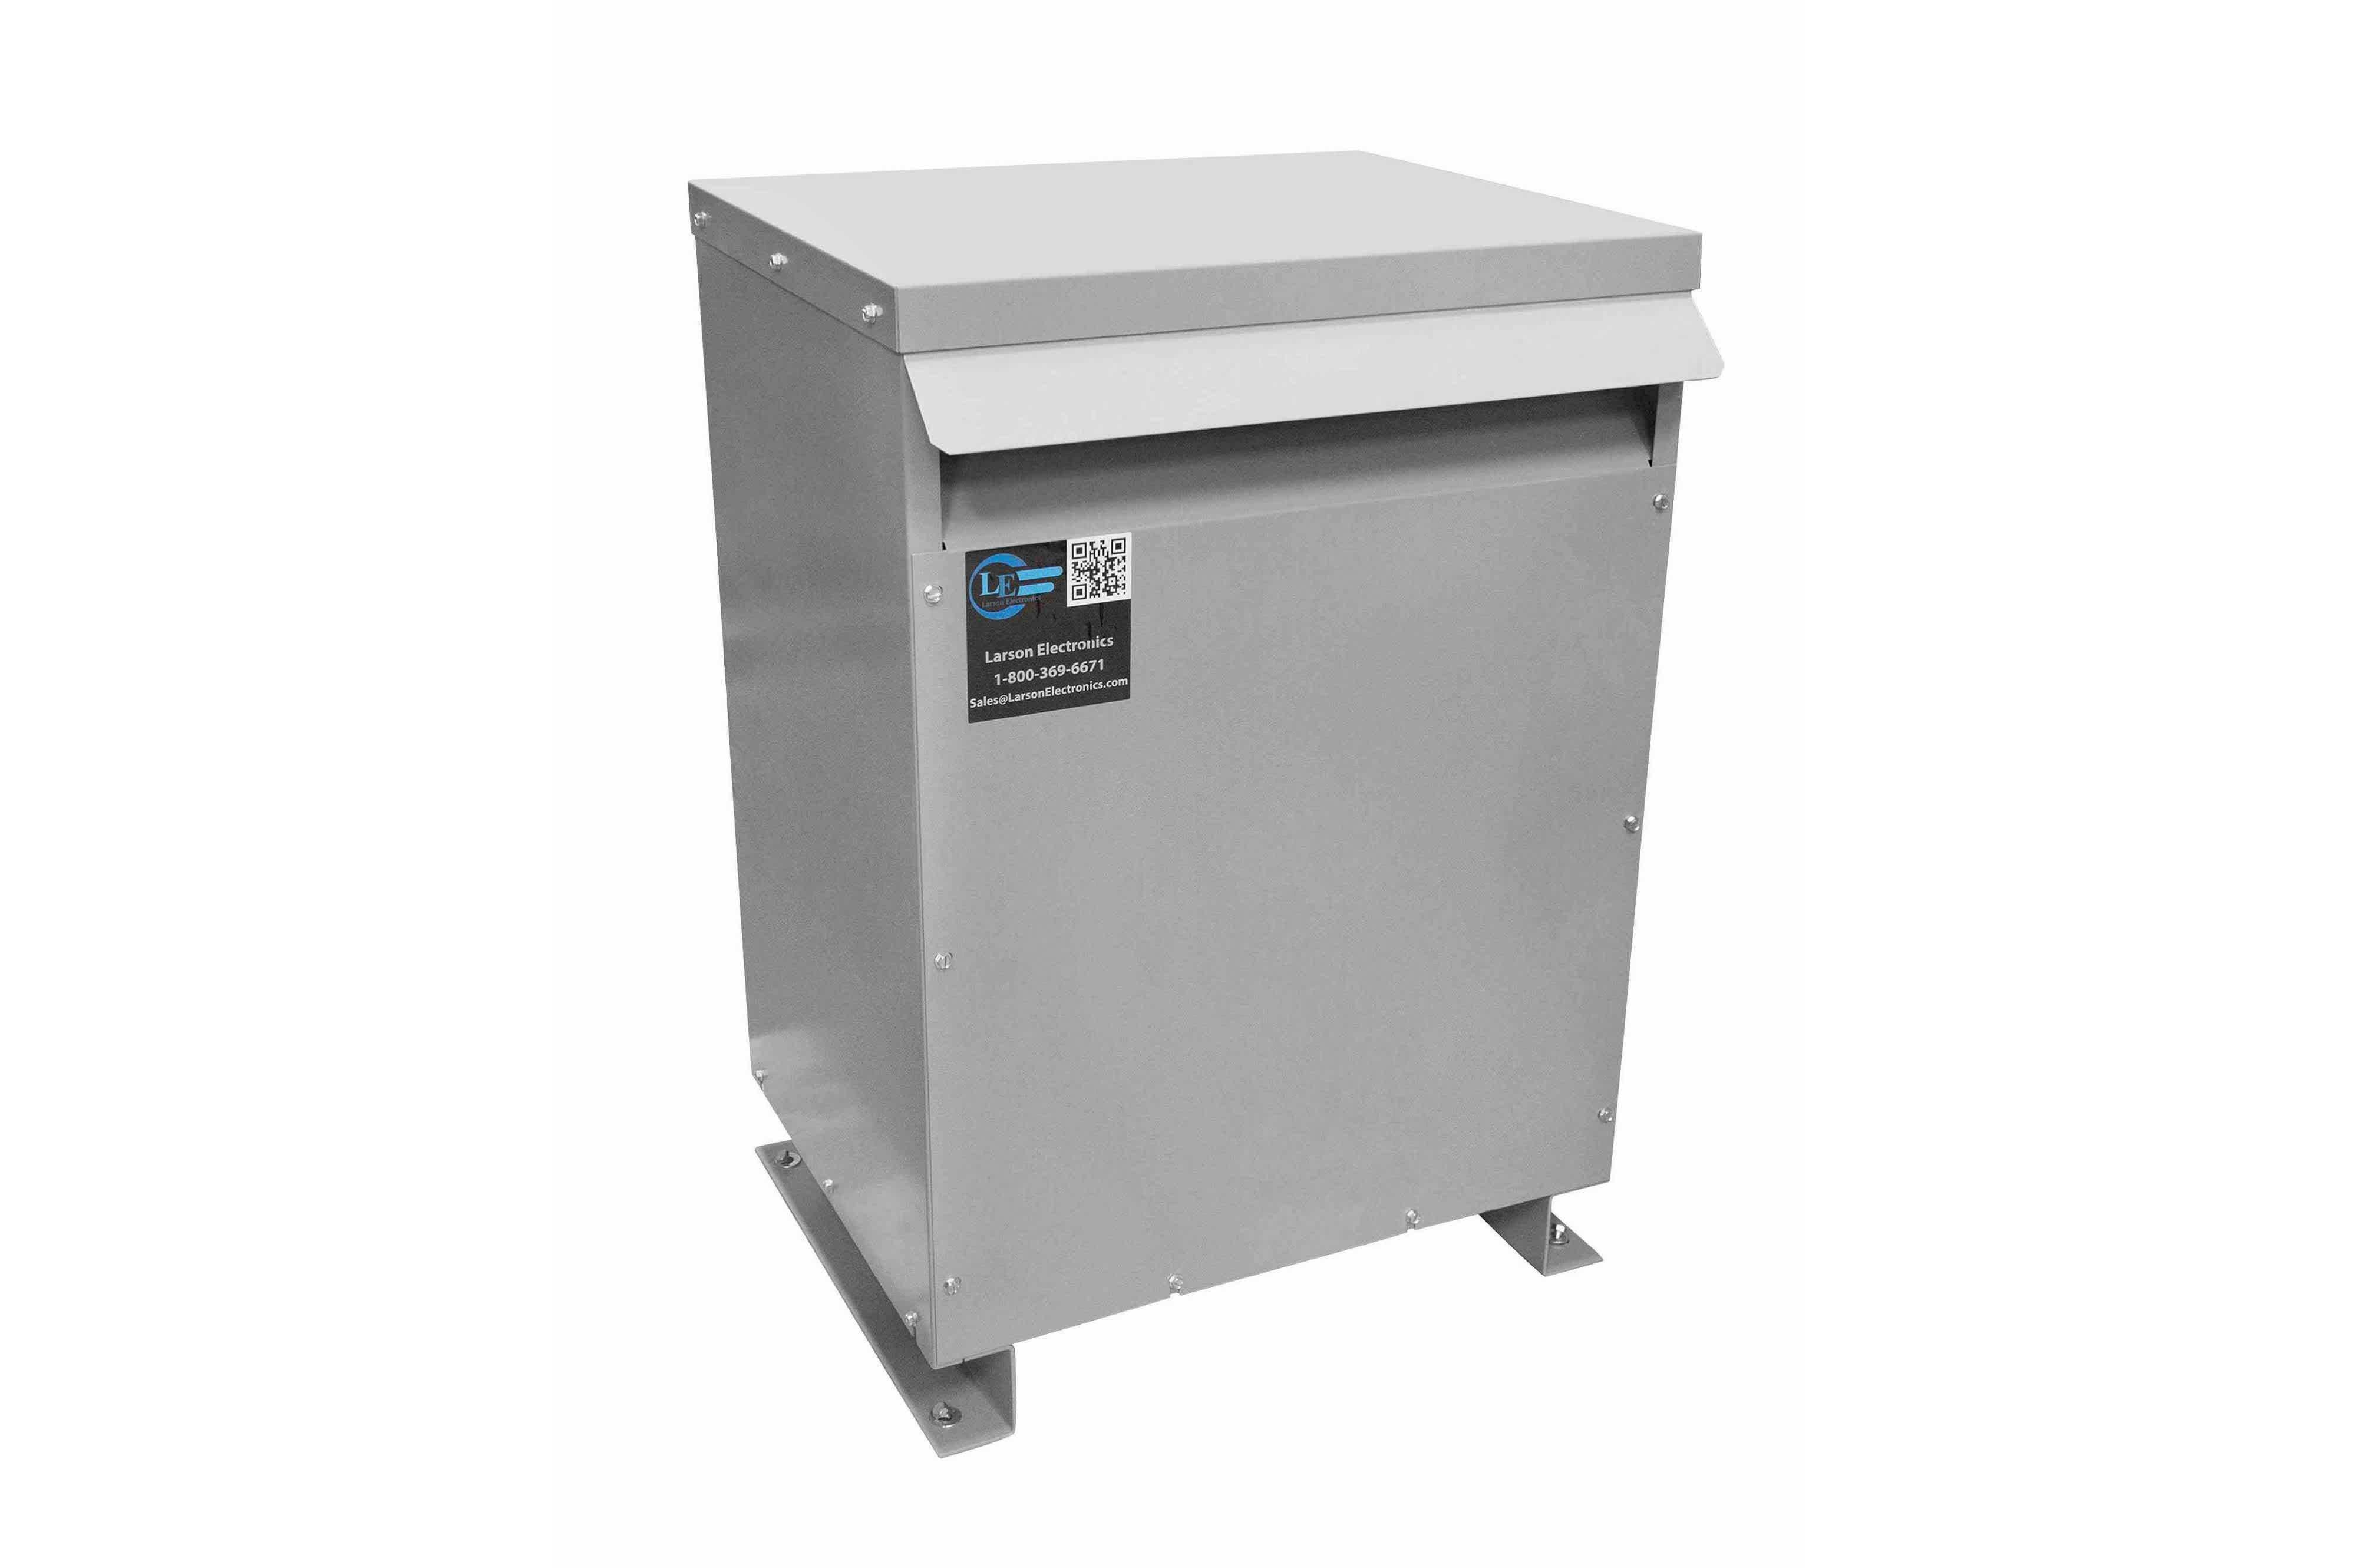 40 kVA 3PH Isolation Transformer, 220V Wye Primary, 208Y/120 Wye-N Secondary, N3R, Ventilated, 60 Hz